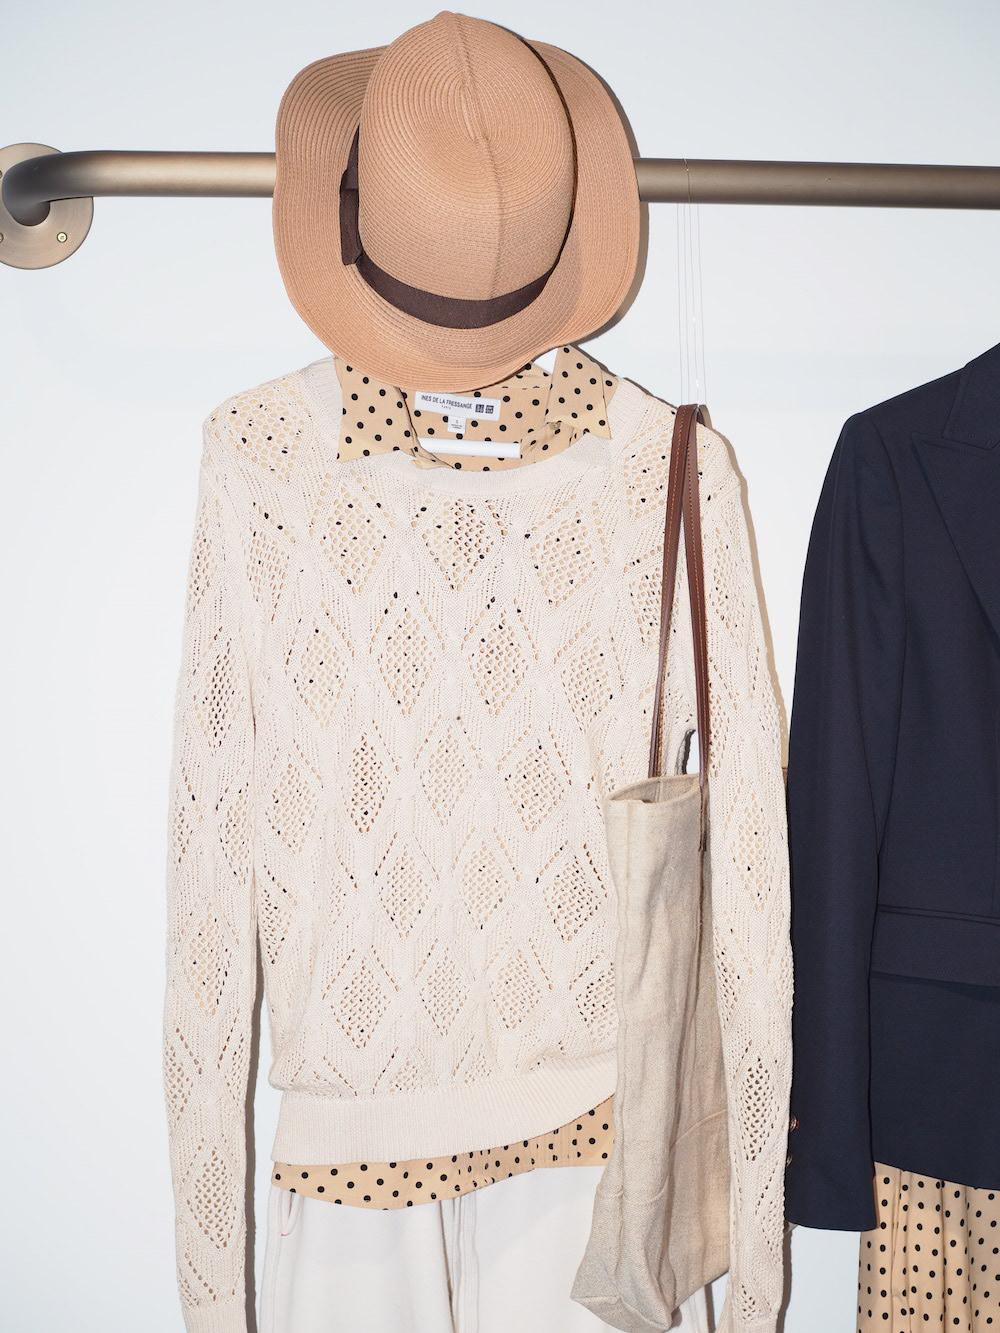 Ines de la Fressange designs on display at Uniqlo Lifewear 2017 SS exhibit in Tokyo